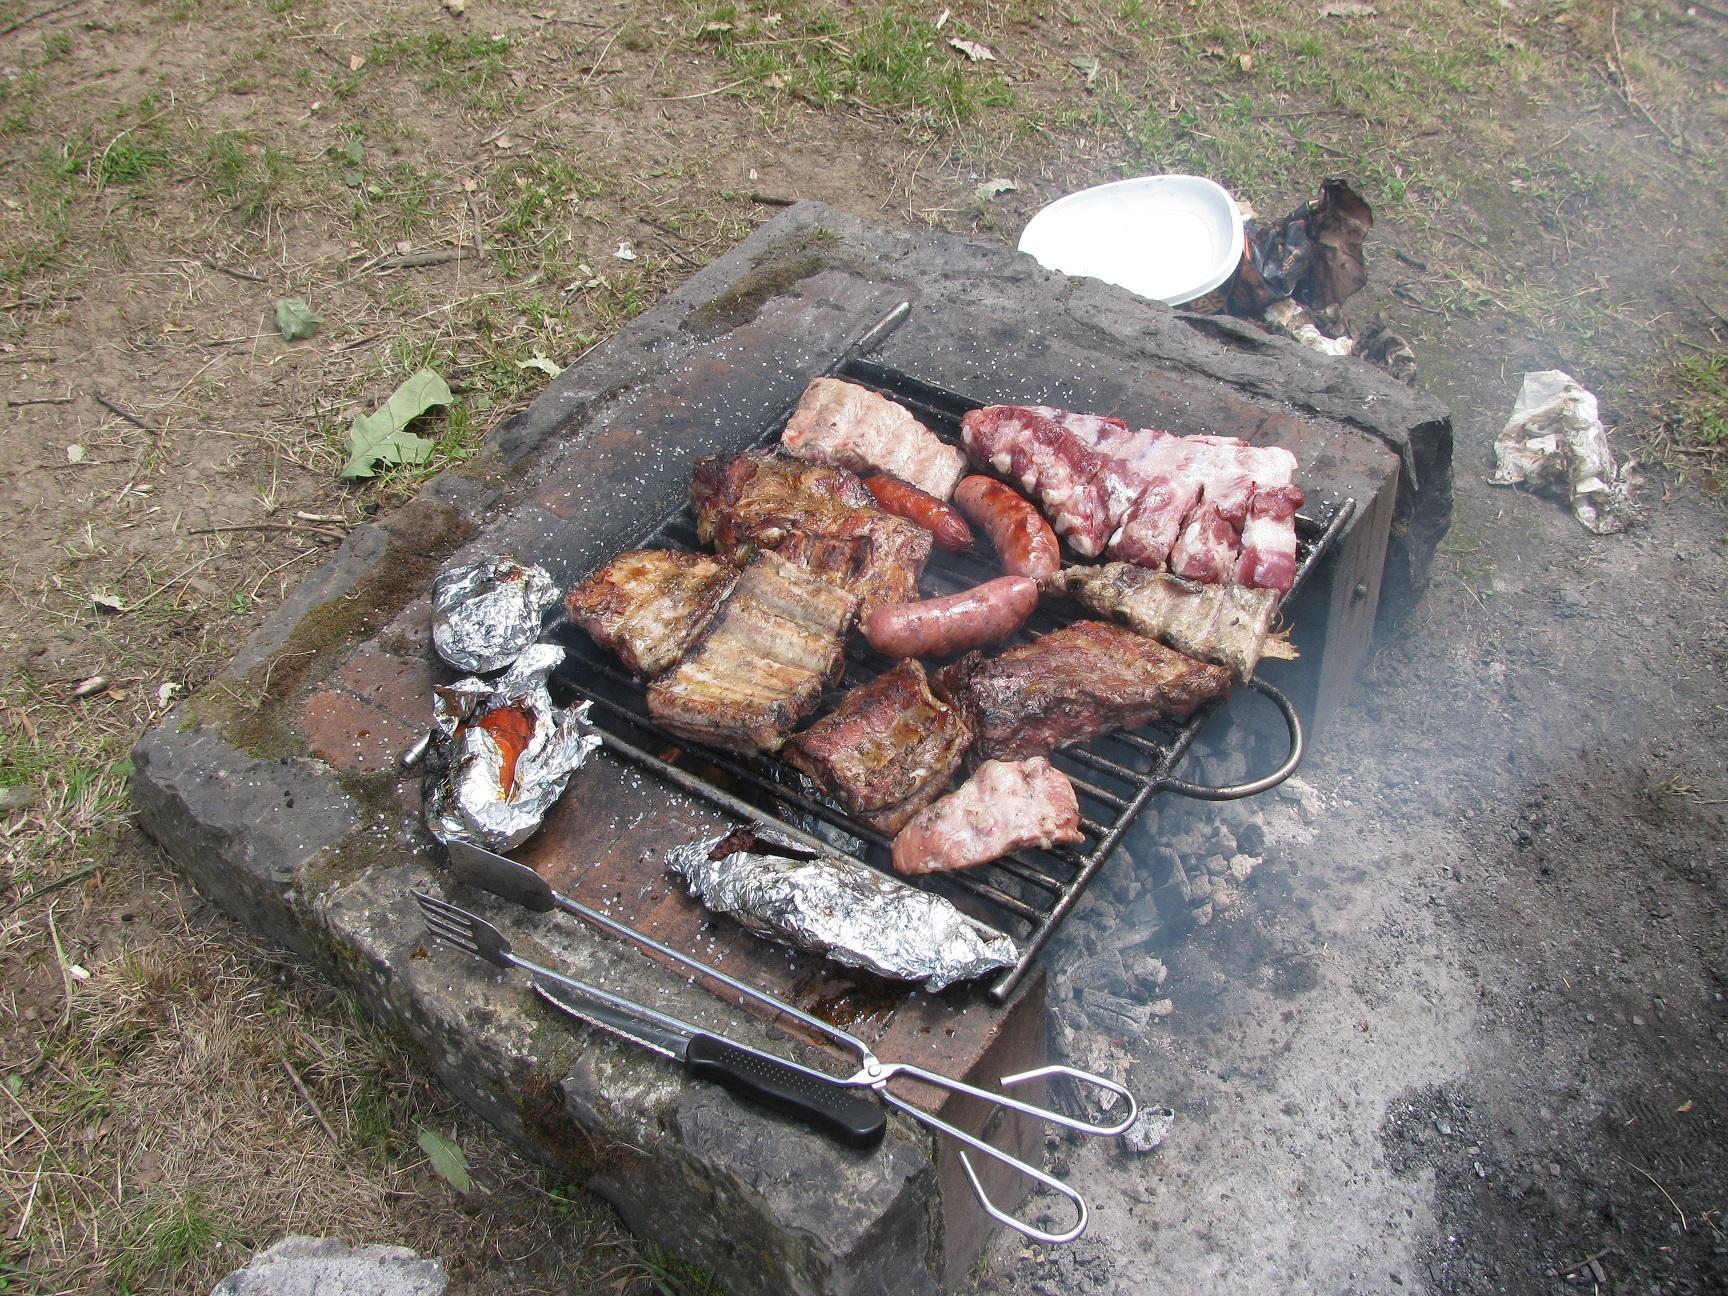 paraes asturianinos (17)